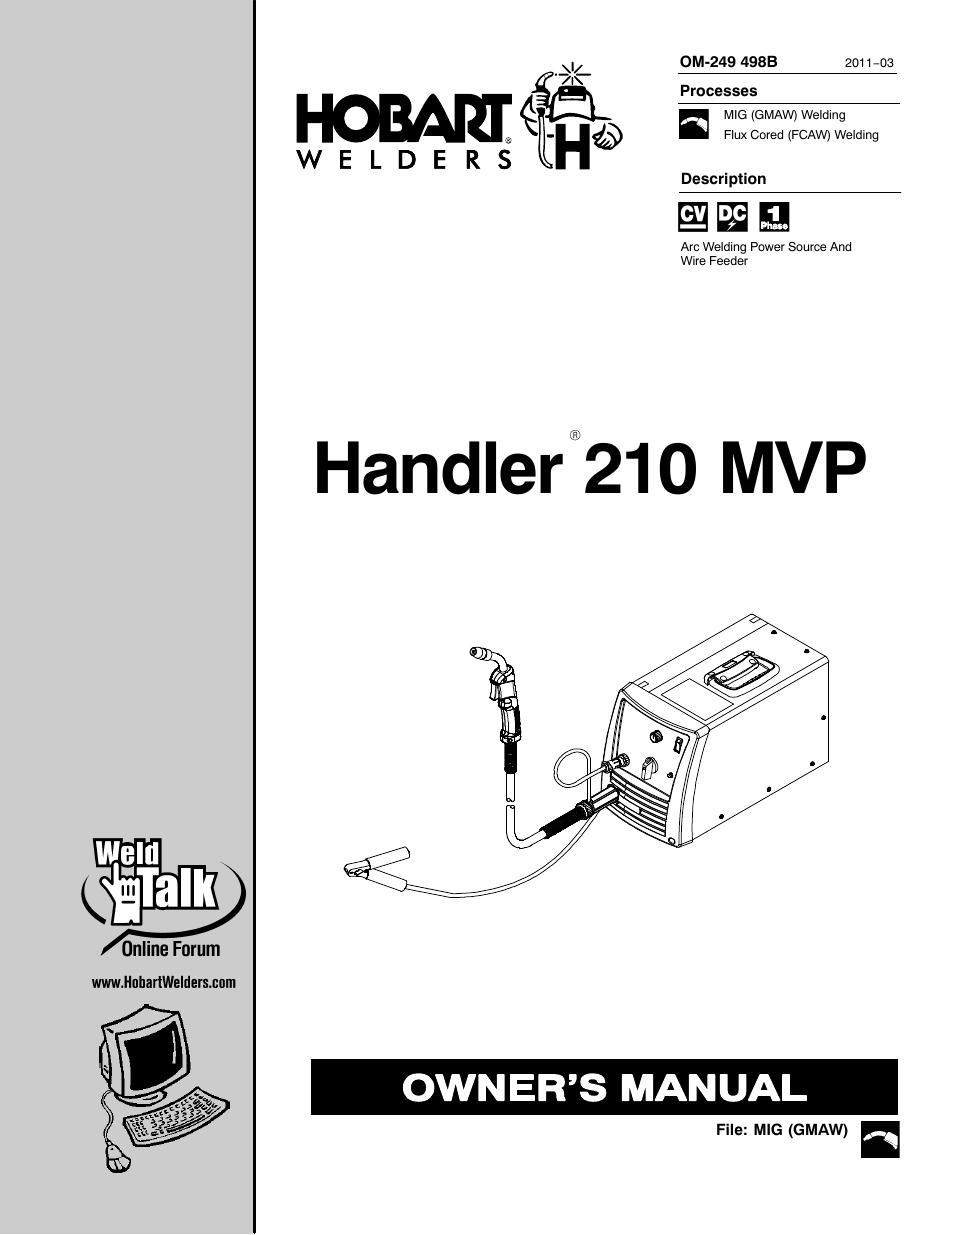 Wiring Diagram For Hobart Handler 120 Hobart Parts Wiring